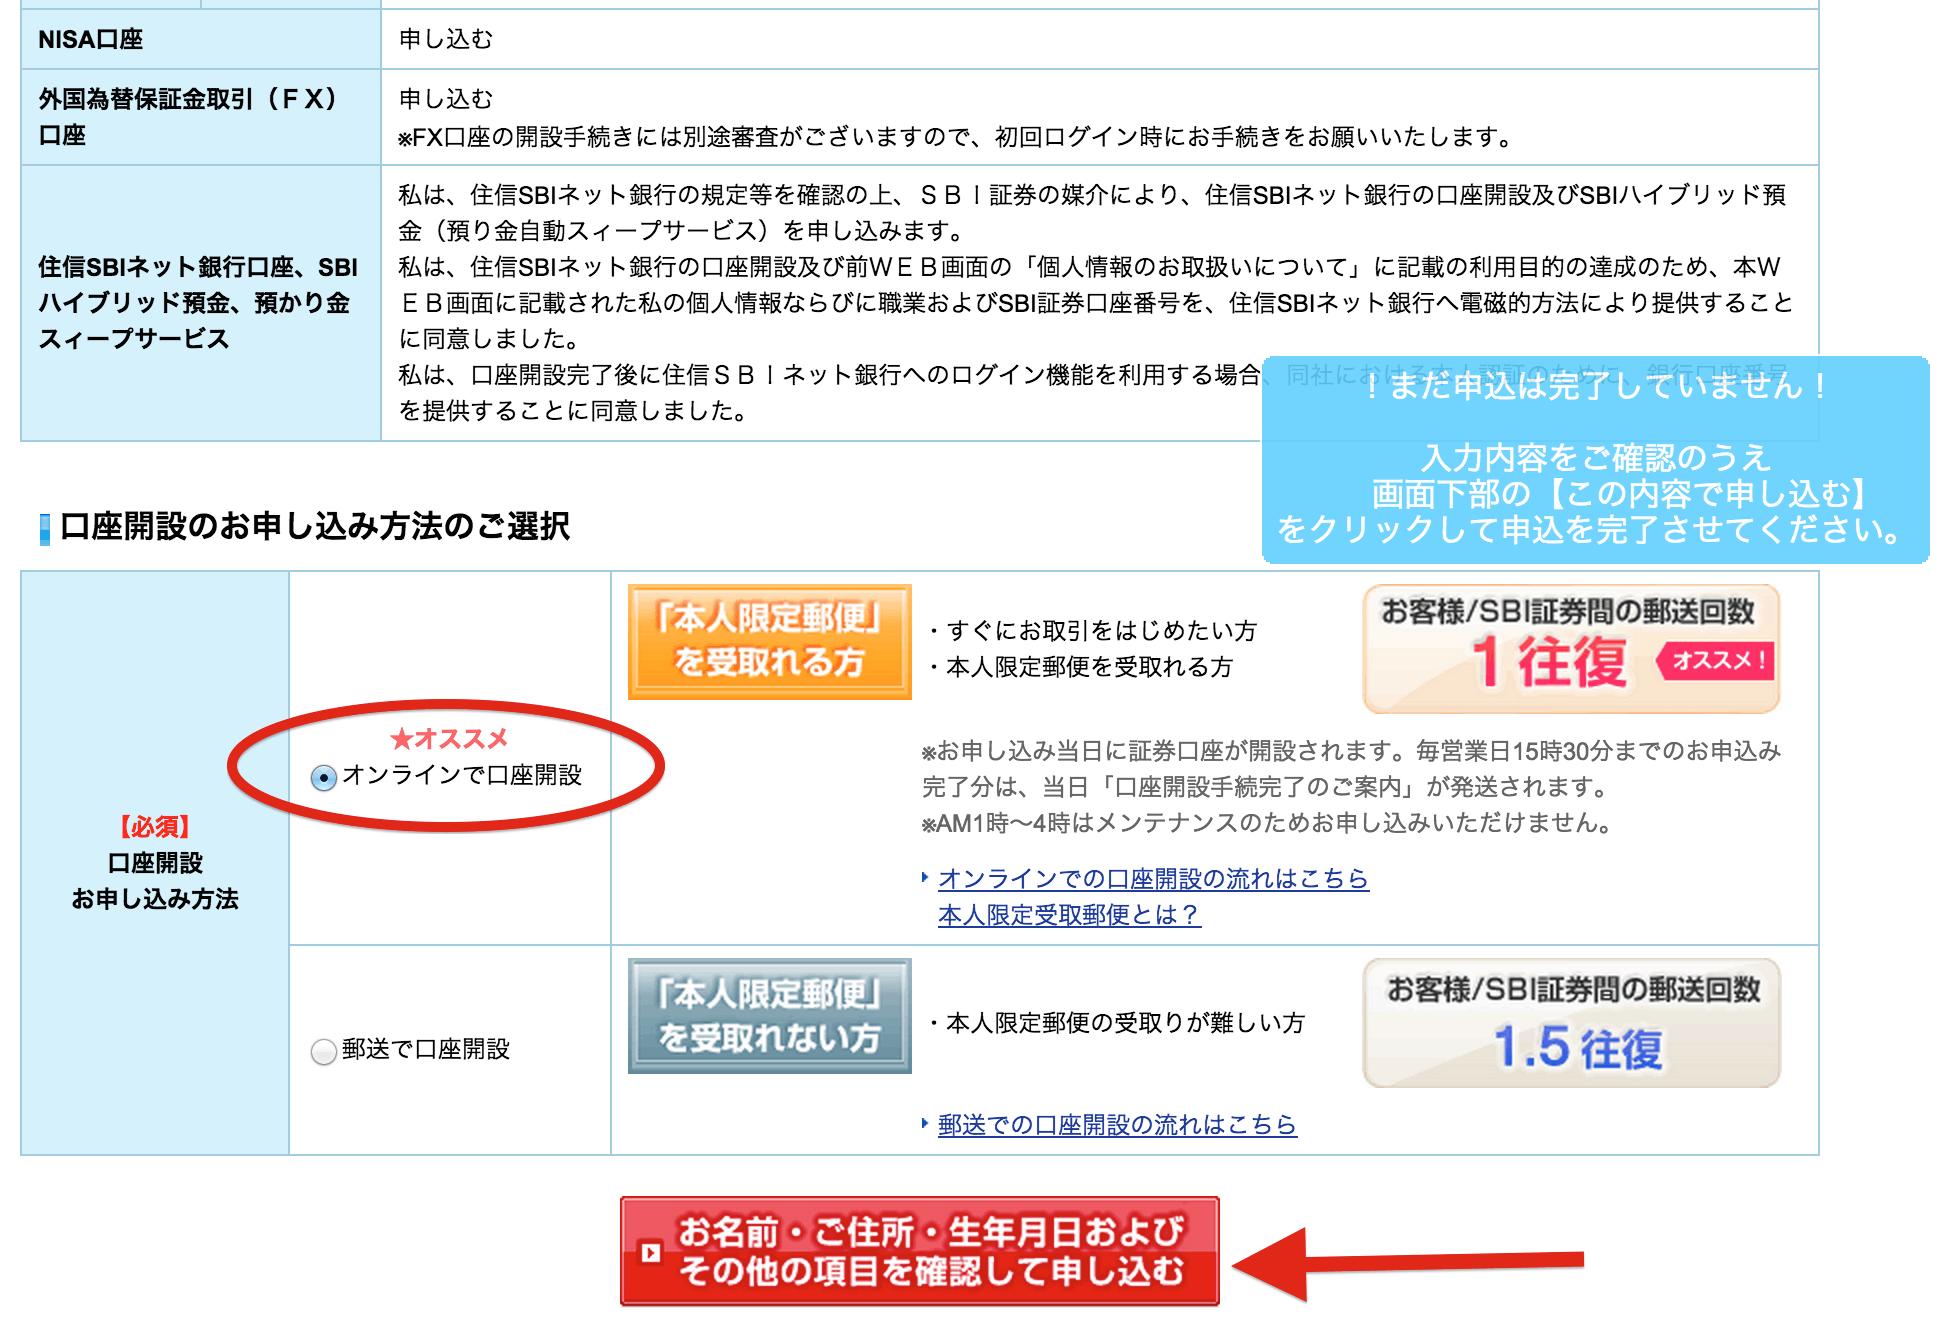 SBI証券口座開設手順7:記入・選択事項を確認後、口座開設申込方法を選択!